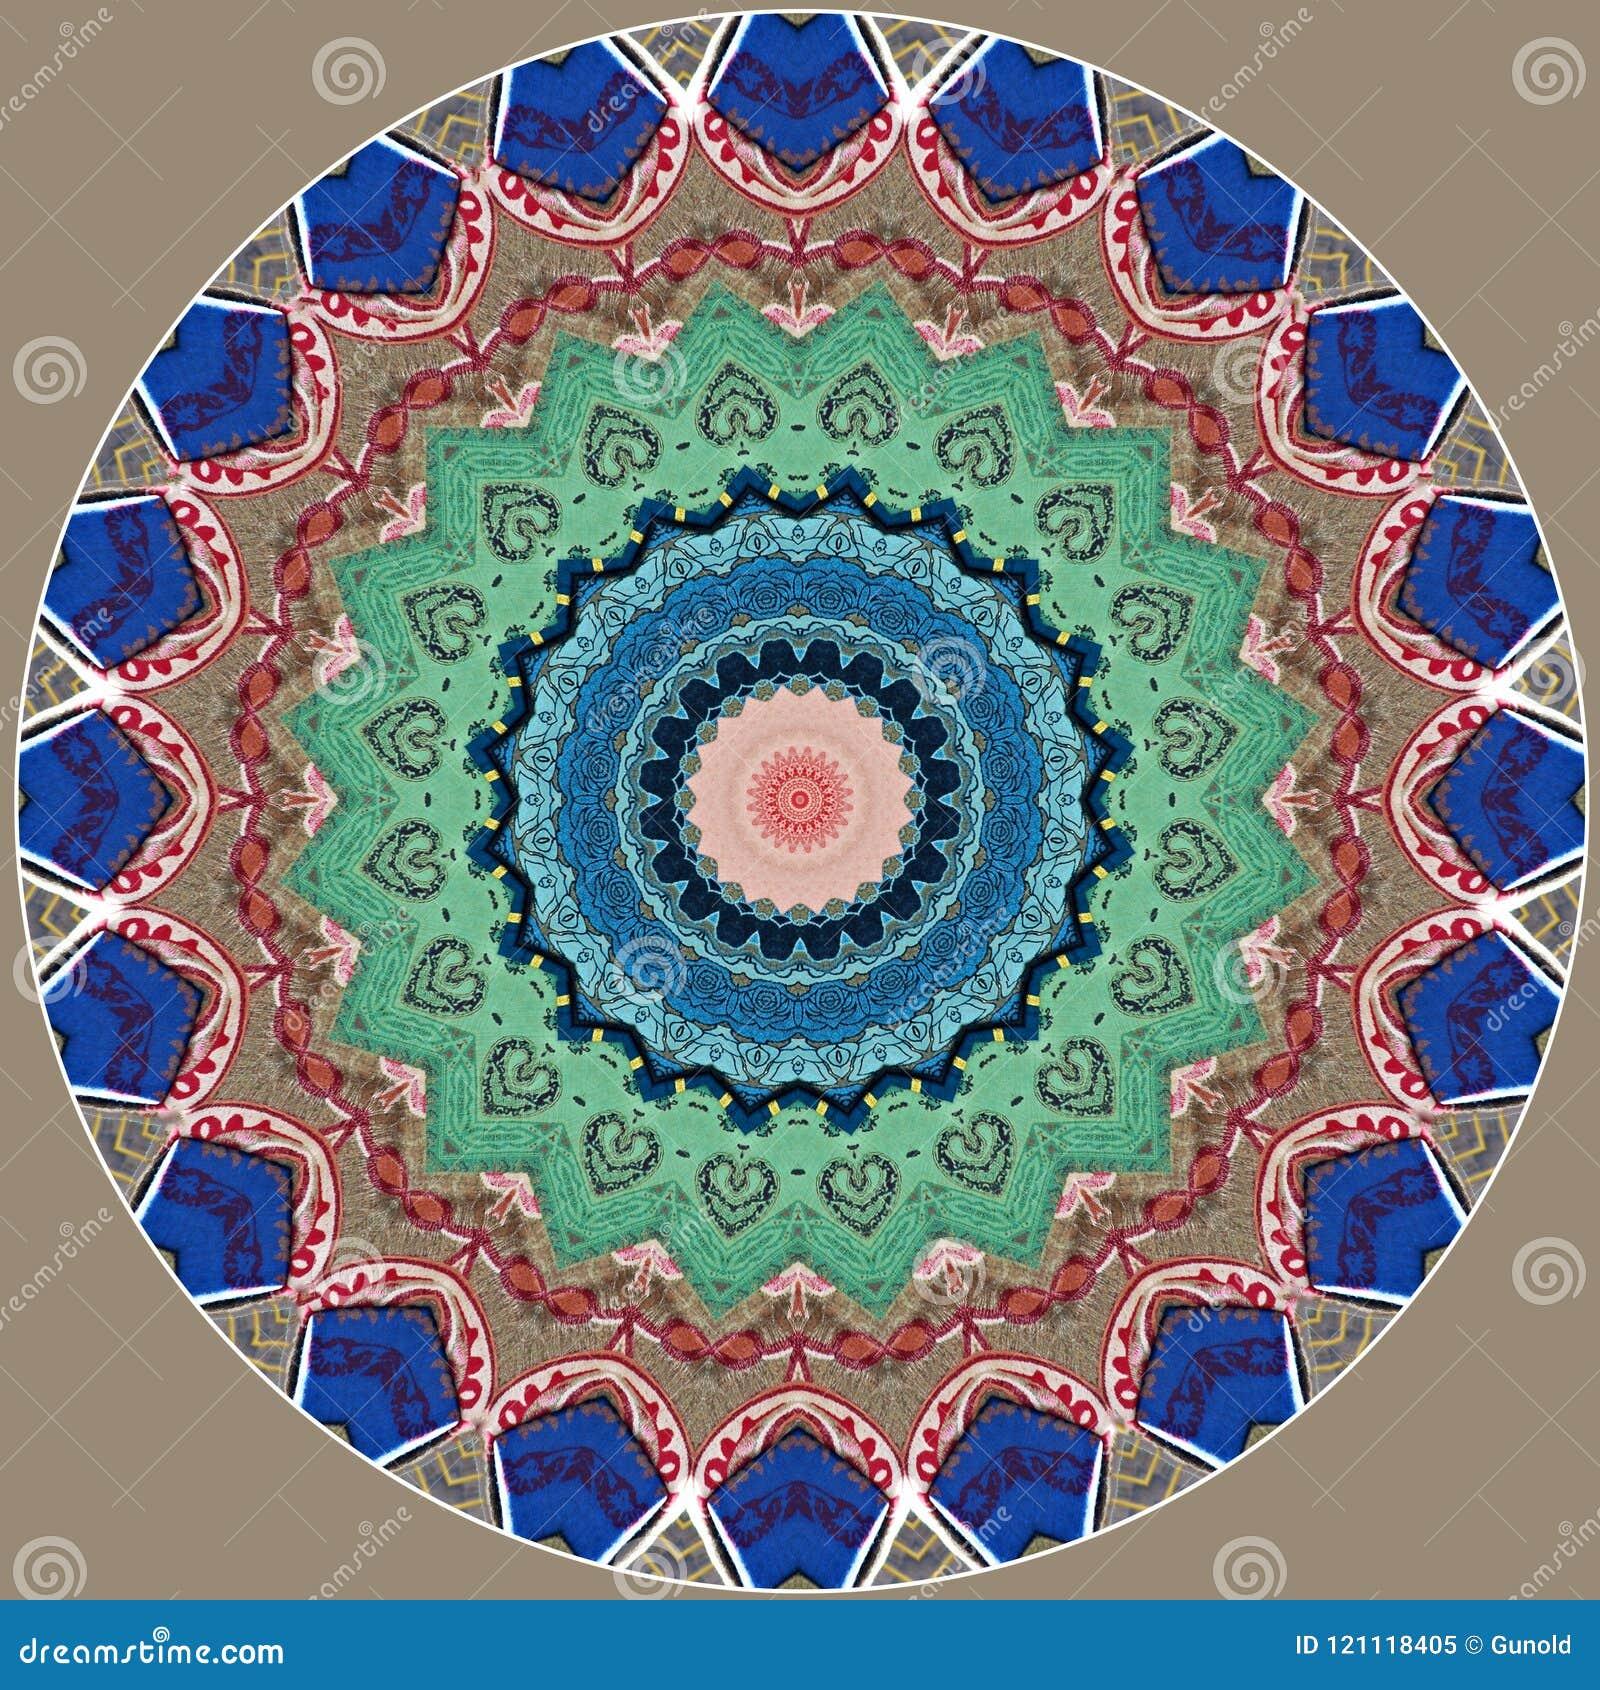 Digital art design, clothes in a bazaar seen through kaleidoscope